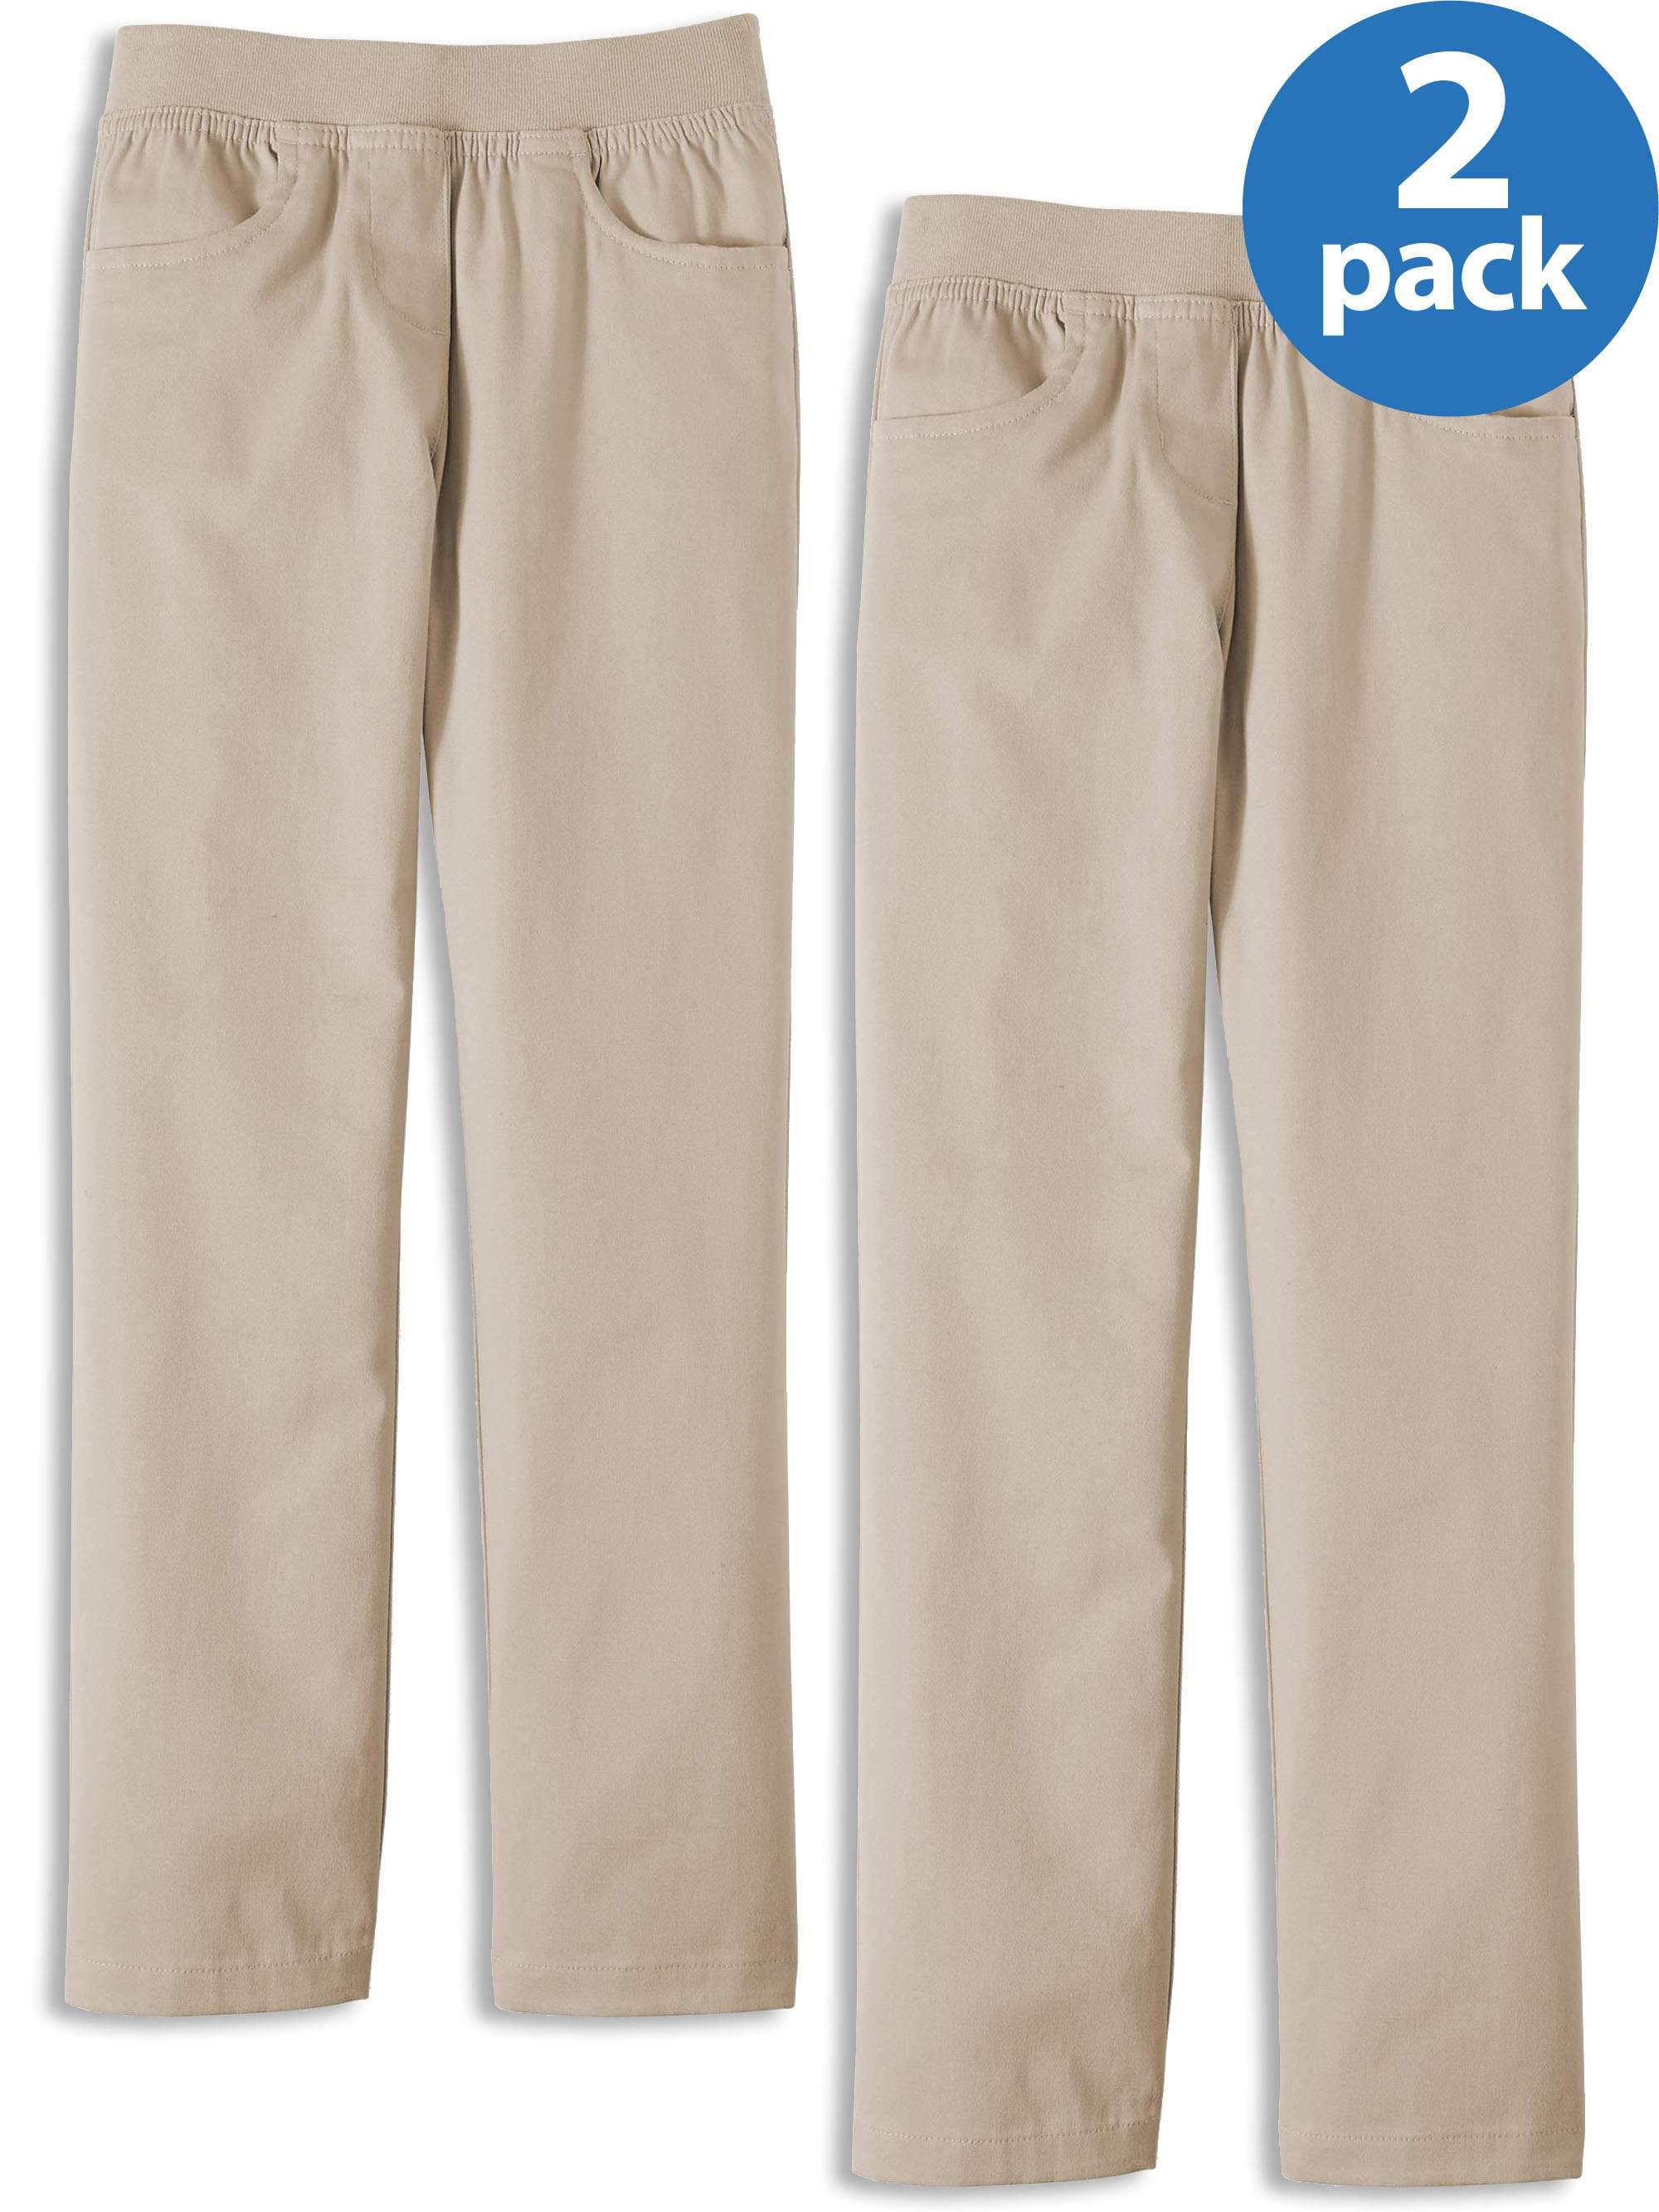 Girls school trousers skinny bootleg straight stretchy office work leggings